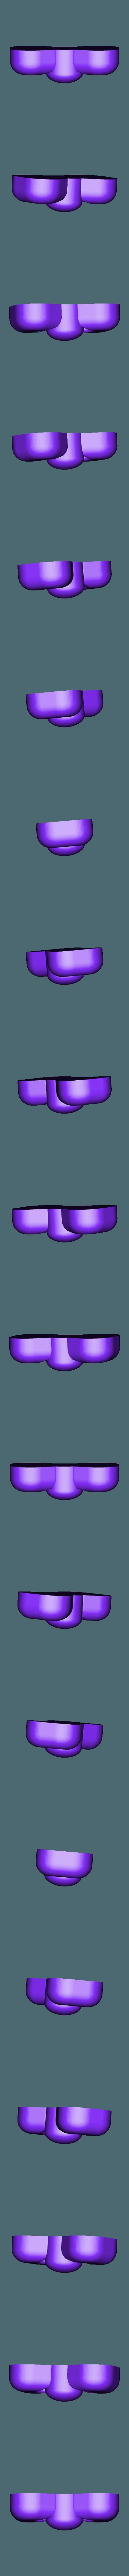 bow red.stl Télécharger fichier STL gratuit Tuxedo Sam (l'ami de Hello Kitty) Pingouin (タキシードサム, Takishīdosamu) • Objet pour impression 3D, Jangie